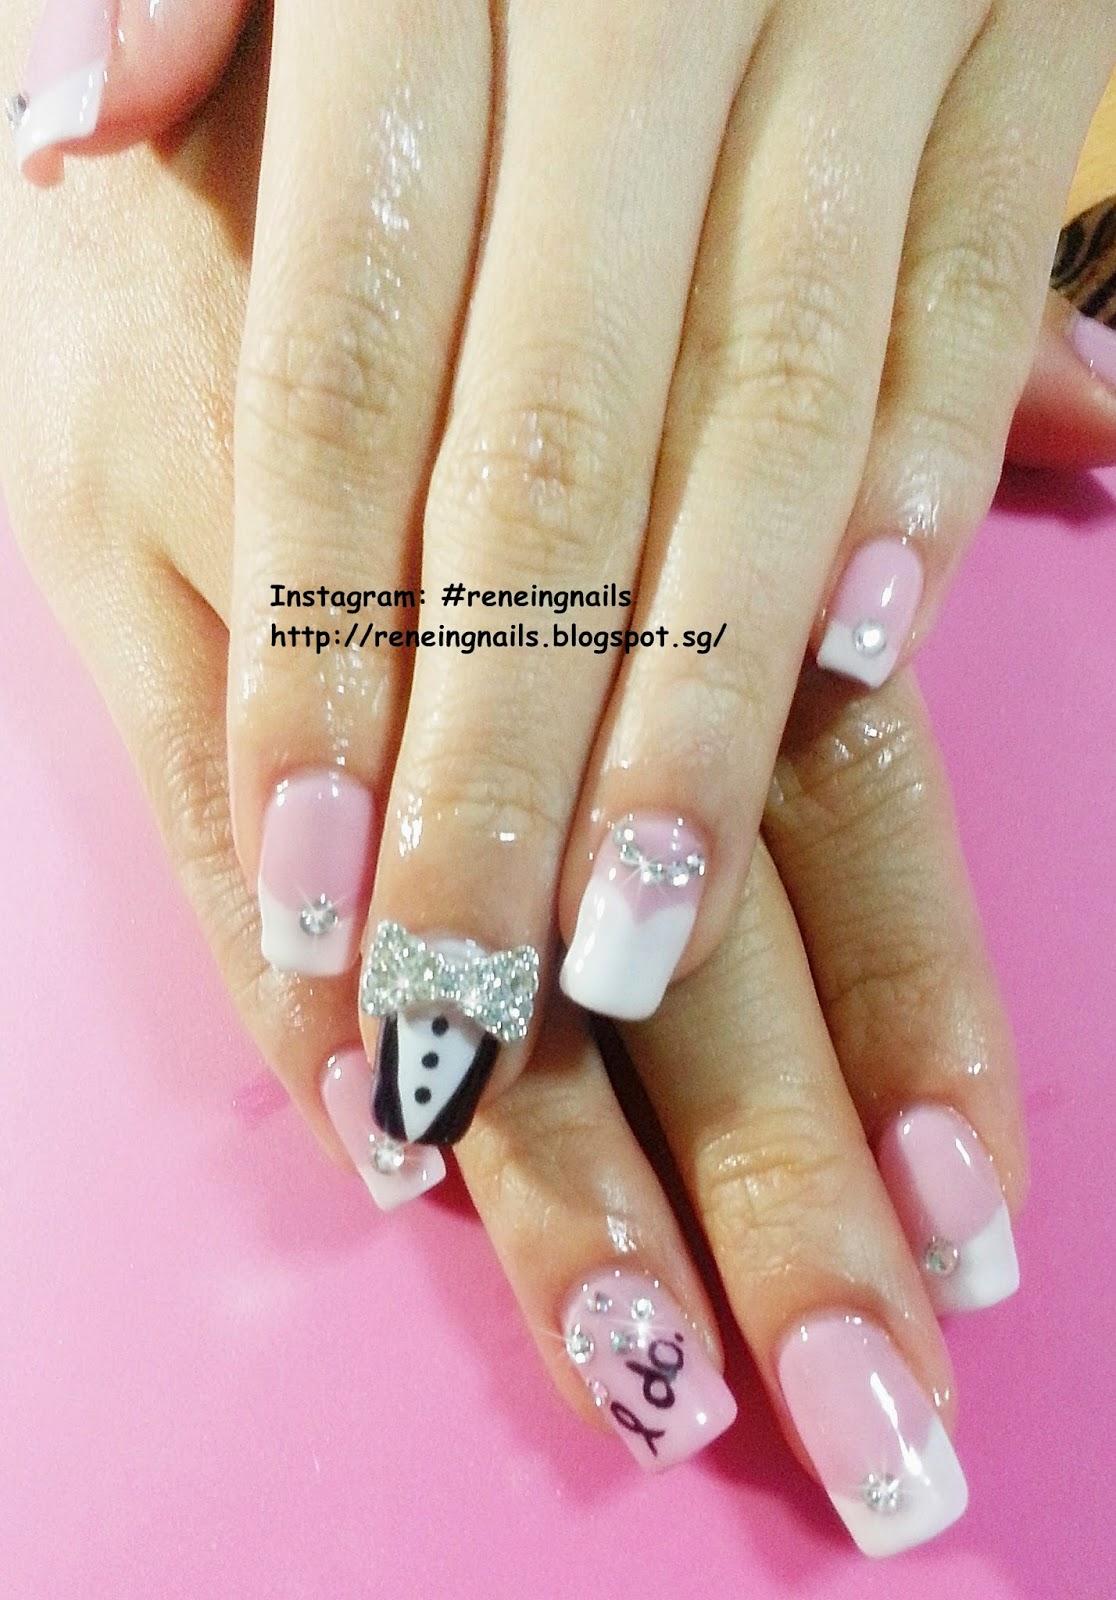 N30650 Peiqing S Wedding Nails Done